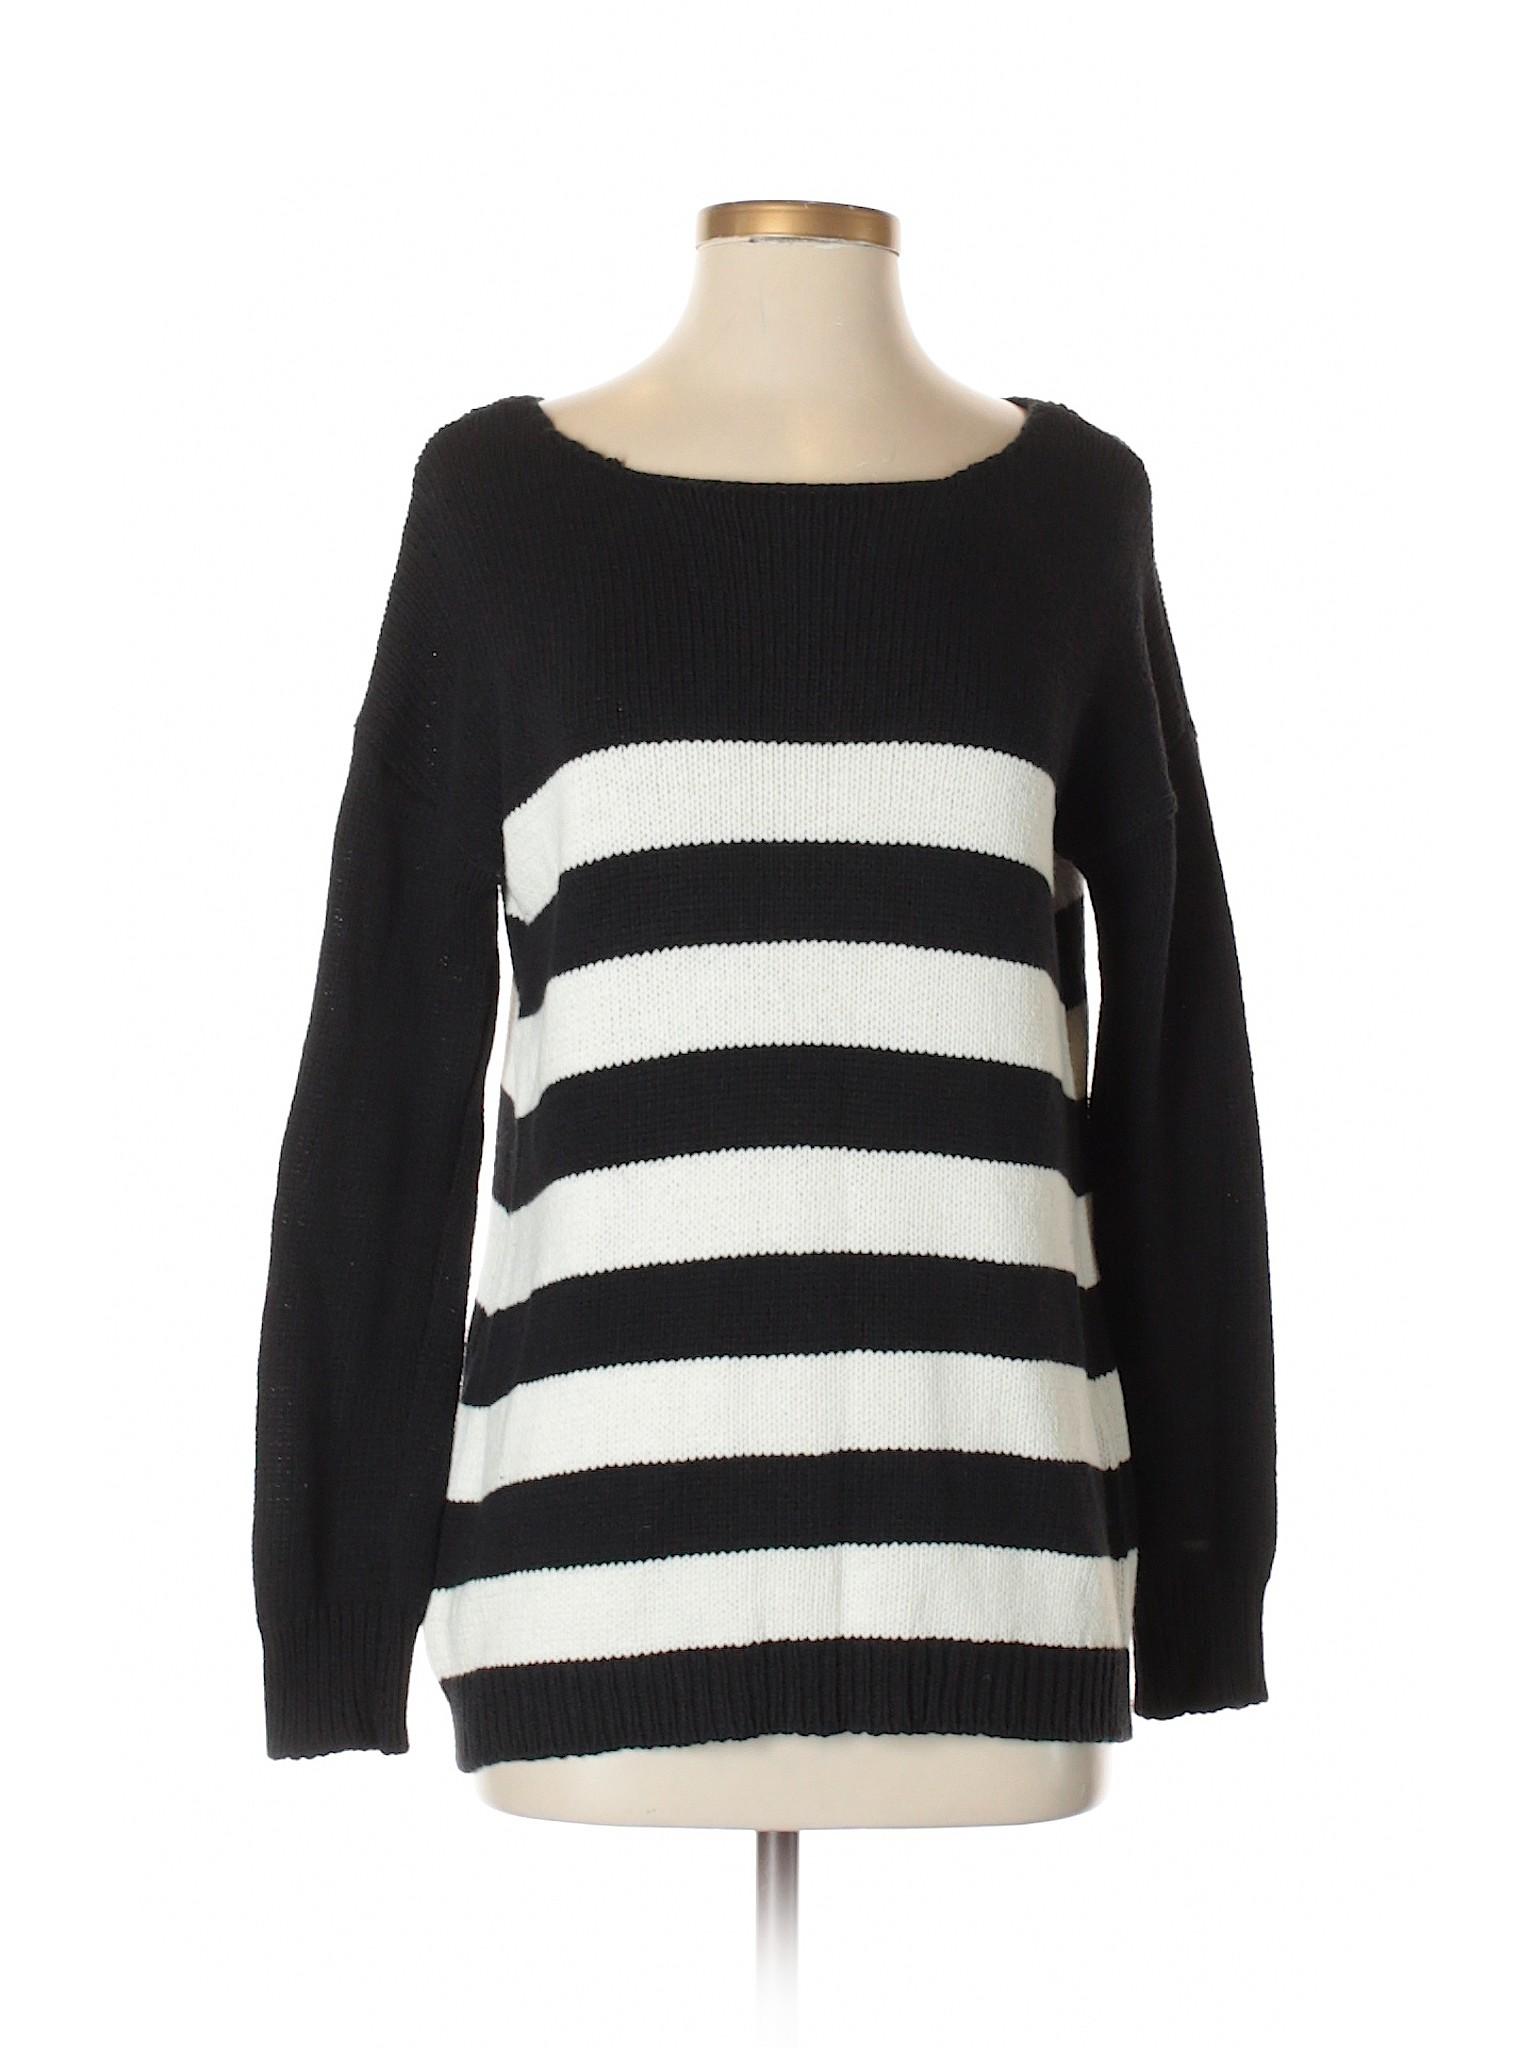 Sweater Pullover BB Boutique Boutique BB Dakota xng71Unw